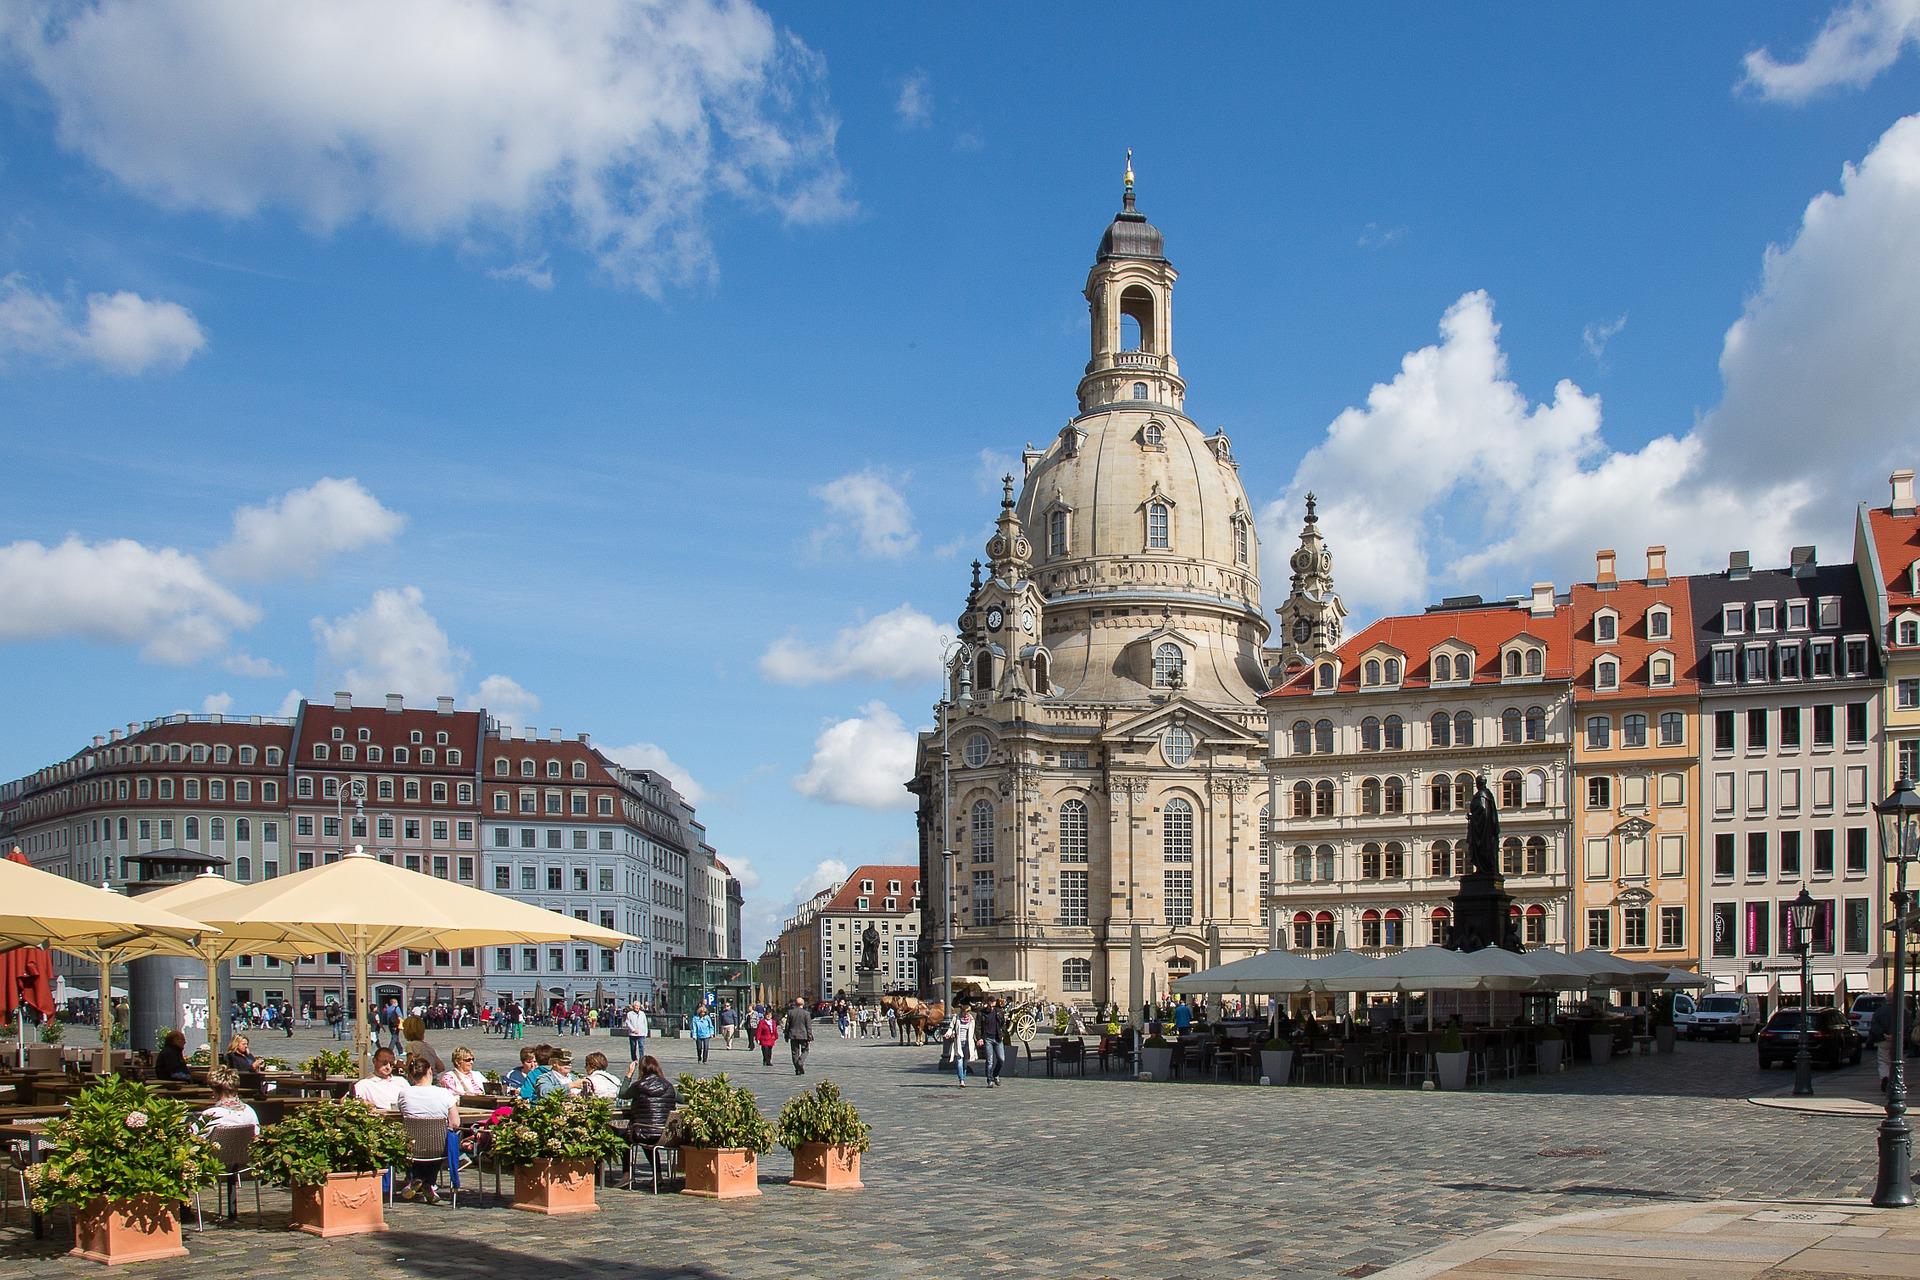 Dresden: ImmobilienMarkt